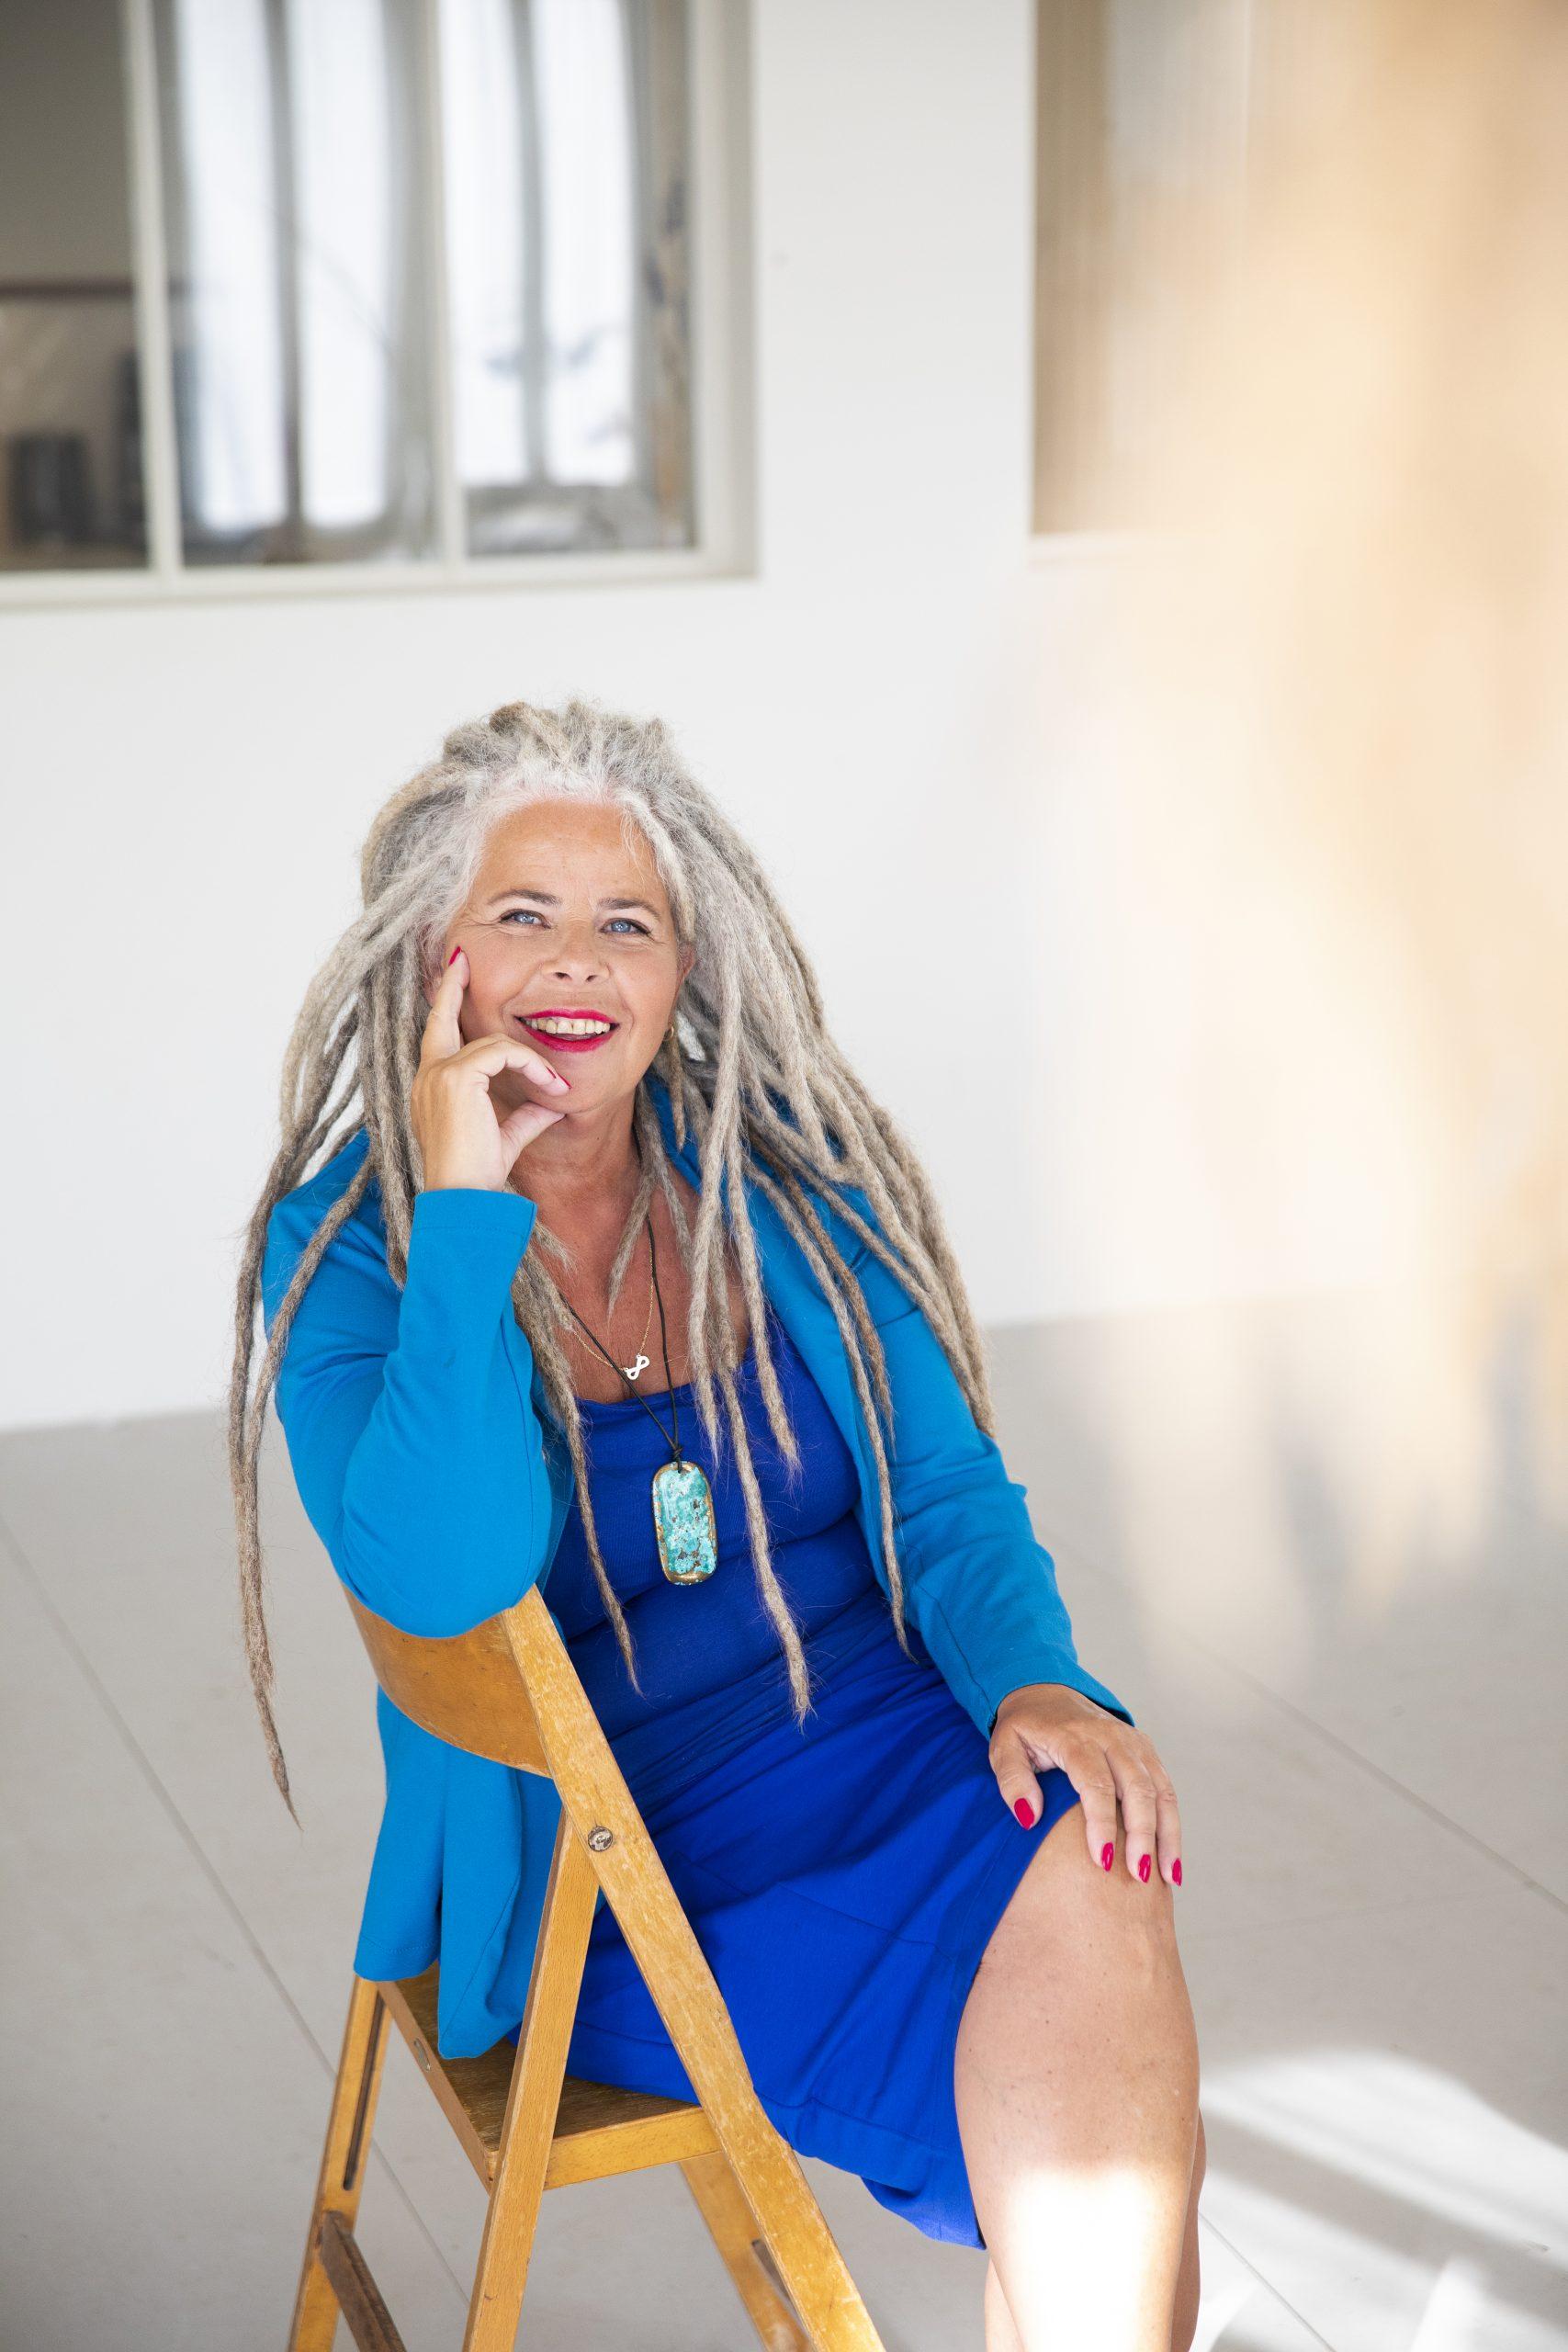 Carla van der Leeden for fabulous after Fifty podcast!